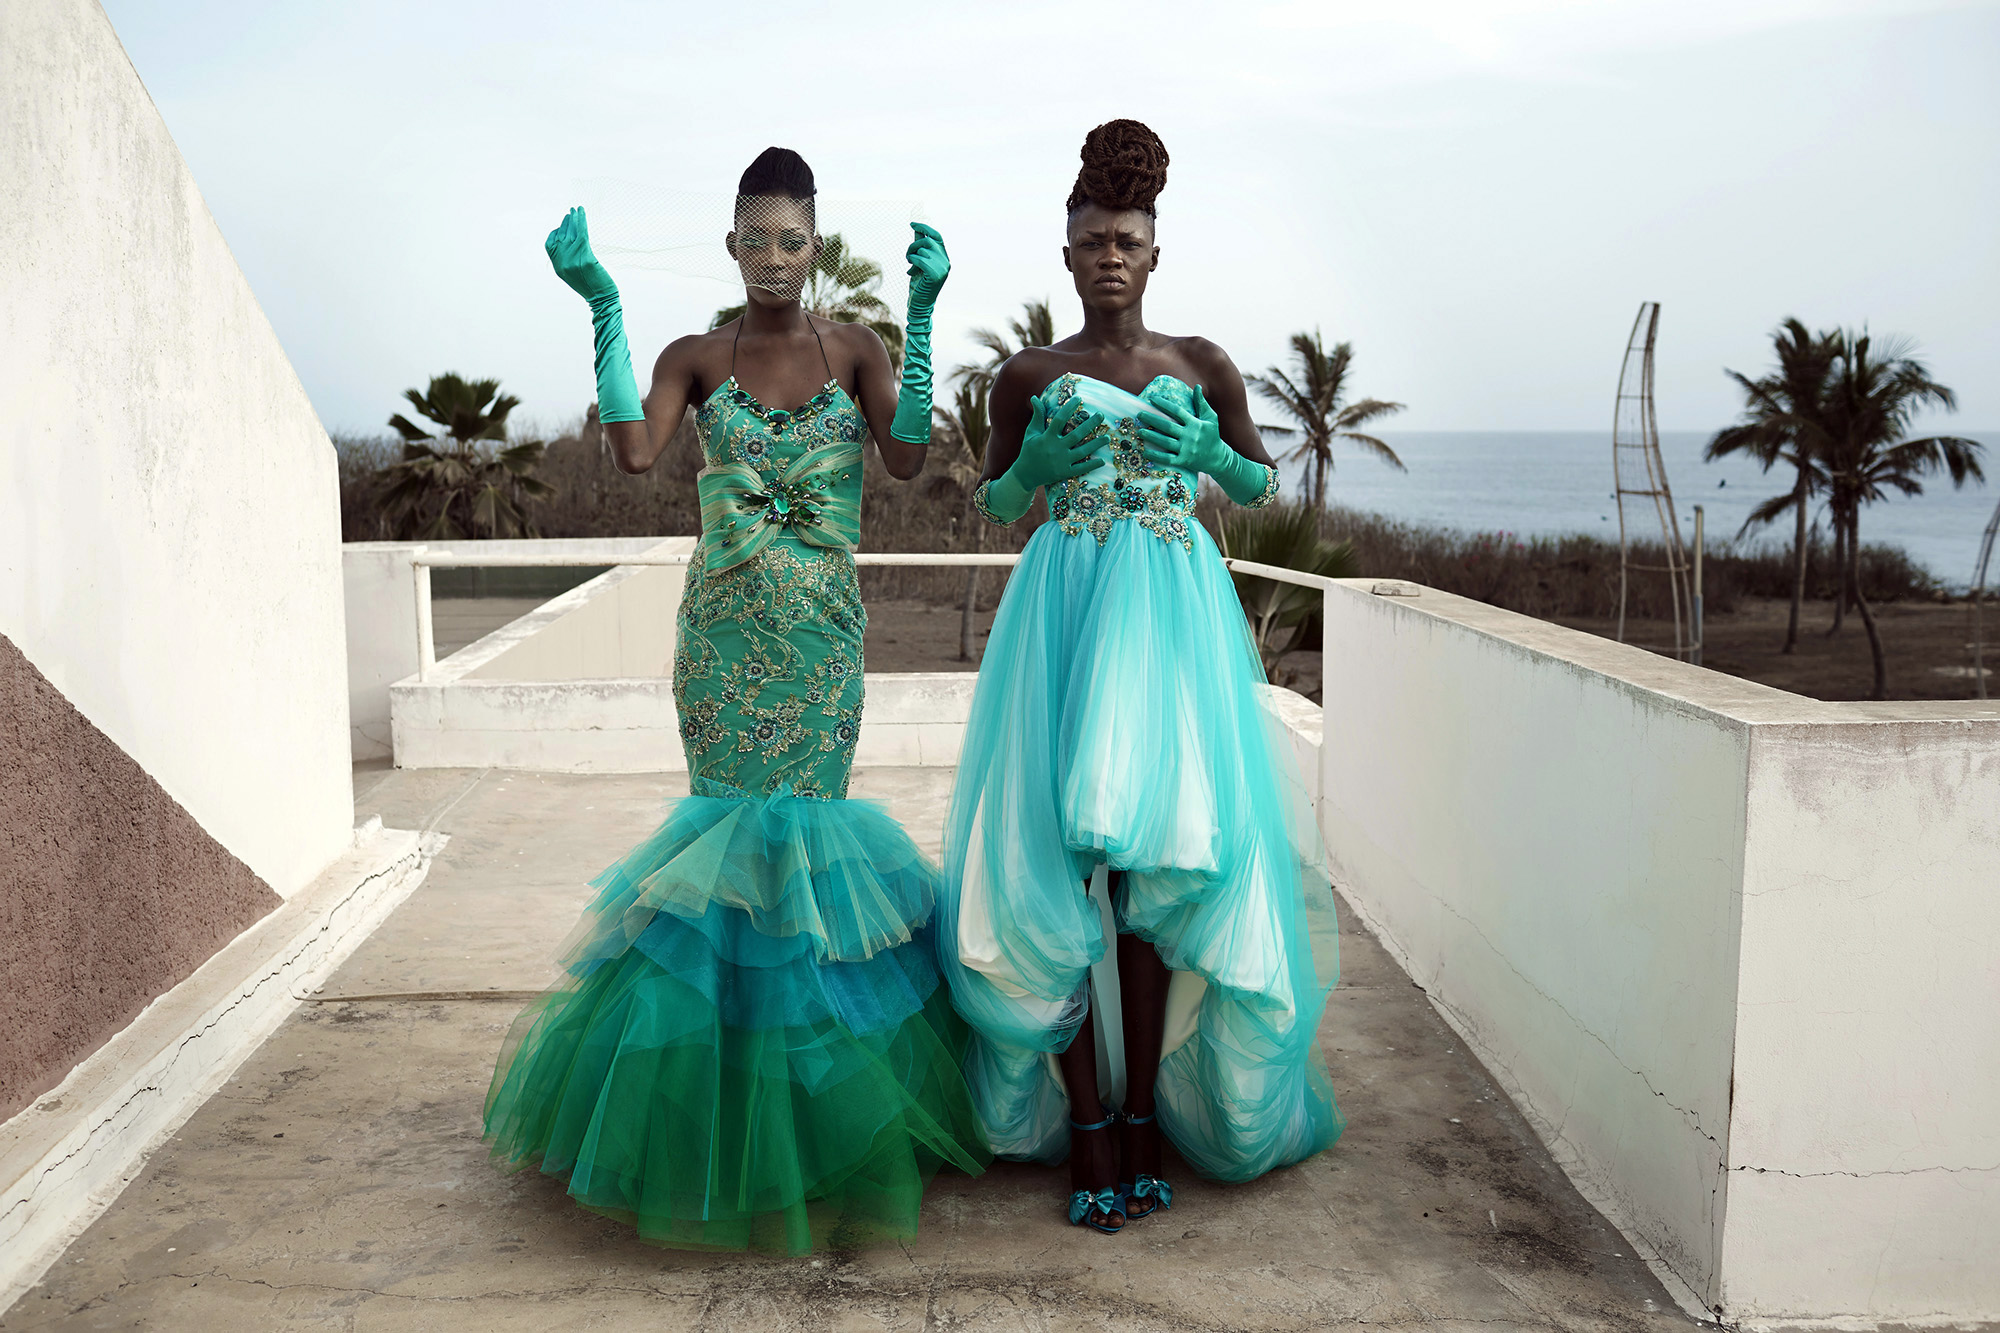 © Per-Anders Pettersson  Titel: Ur serien African Catwalk Plats/Datum: Senegal 2014 Bildmått 60x90 cm (pappersmått 70x100 cm) Teknik: Digital c-print Upplaga: 7+2 AP   (#4/7)  Signerad: Ja Pris: SEK 17 000 (avser oinramad bild)